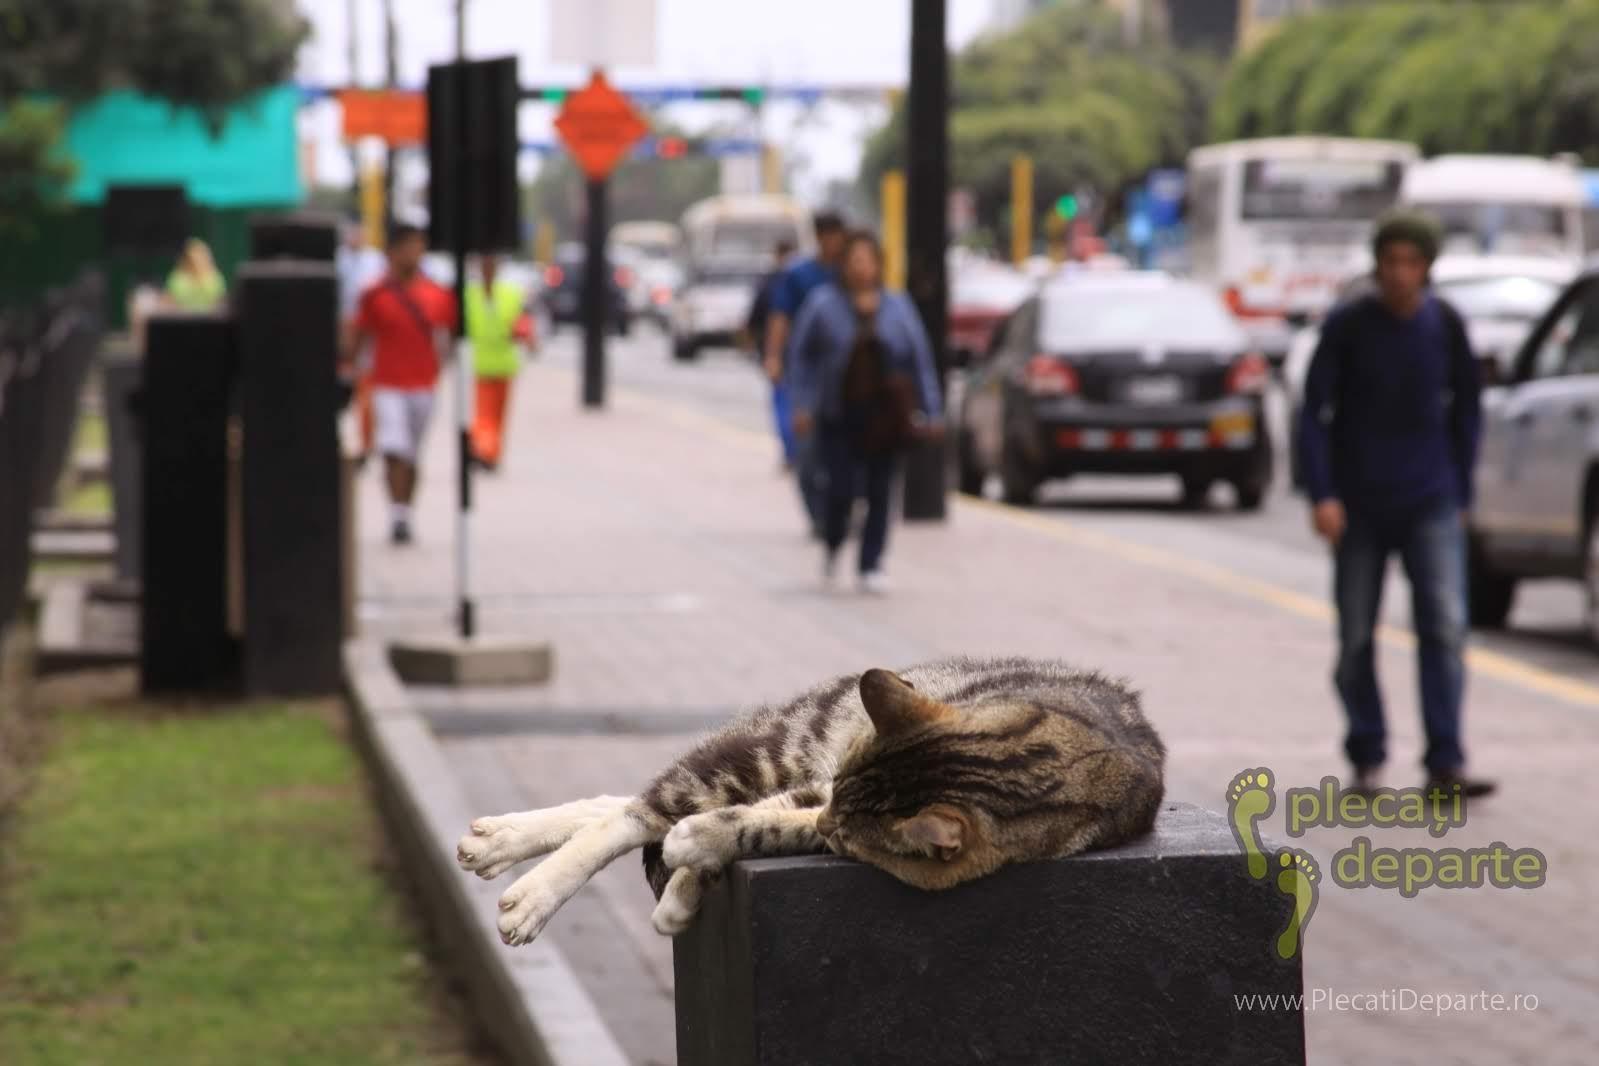 pisica pe strada, in cartierul Miraflores, in zona centrala a orasului Lima, capitala Peru